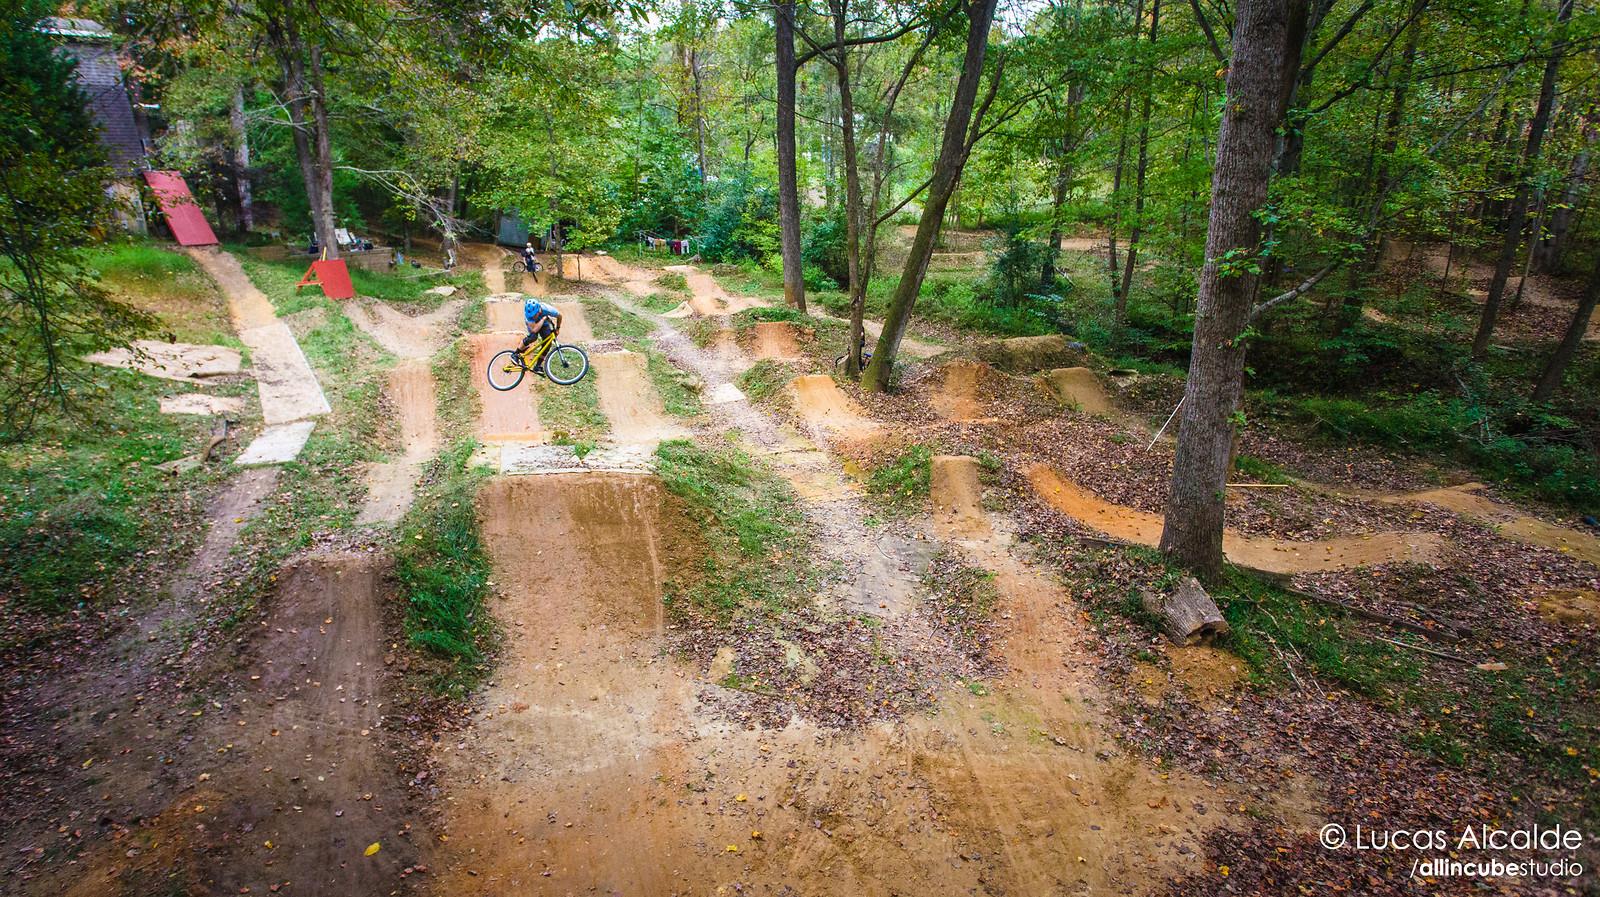 Brad's Backyard - a playground for bikers - Lucas_Alcalde - Mountain Biking Pictures - Vital MTB